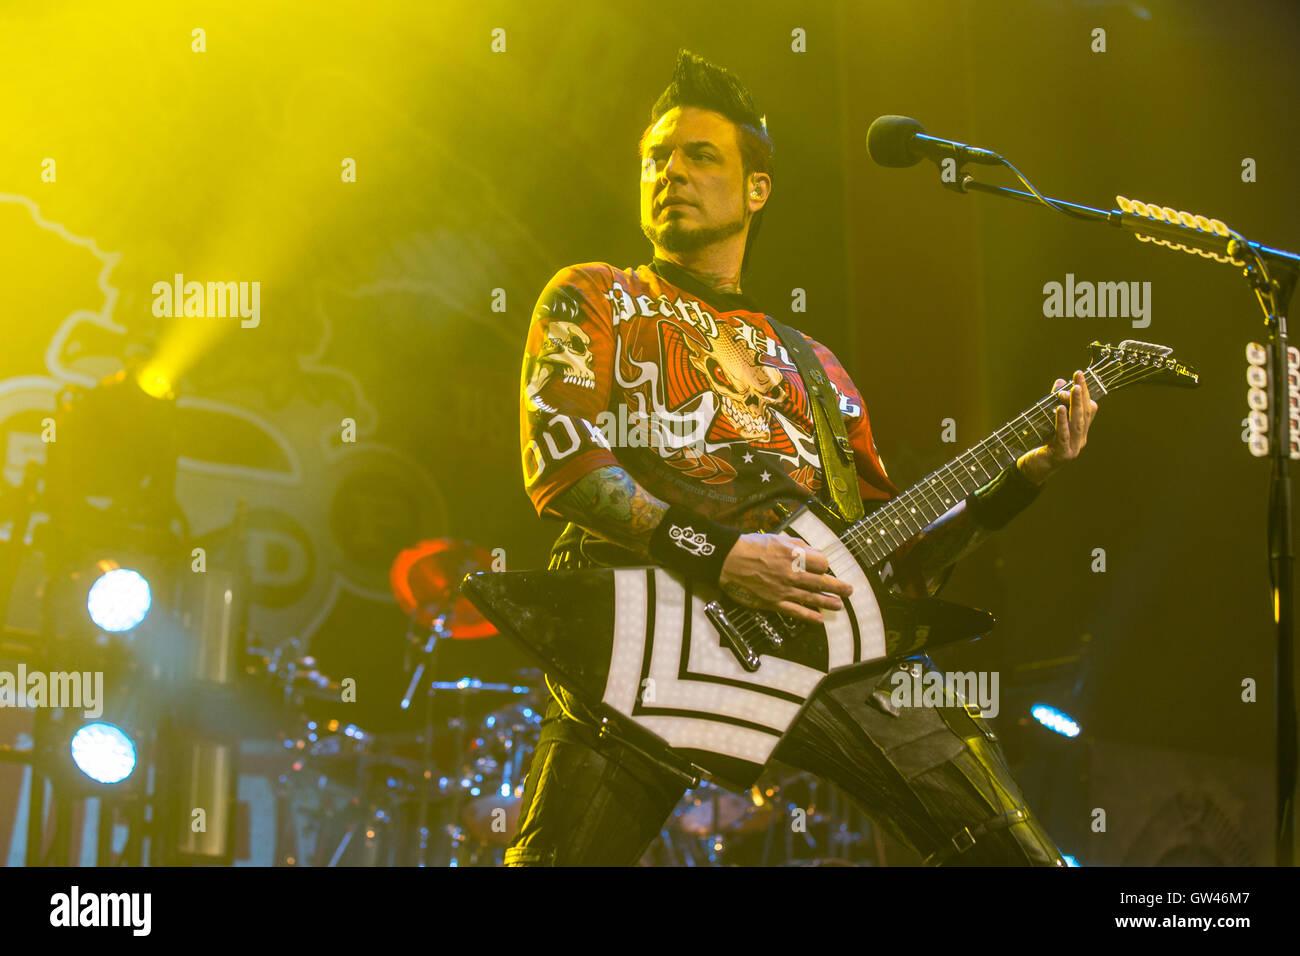 Jason Hook, guitarrista de muerte de cinco dedos punzón en Abbotsford Centro en Abbotsford, Canadá el 9 de septiembre Foto de stock